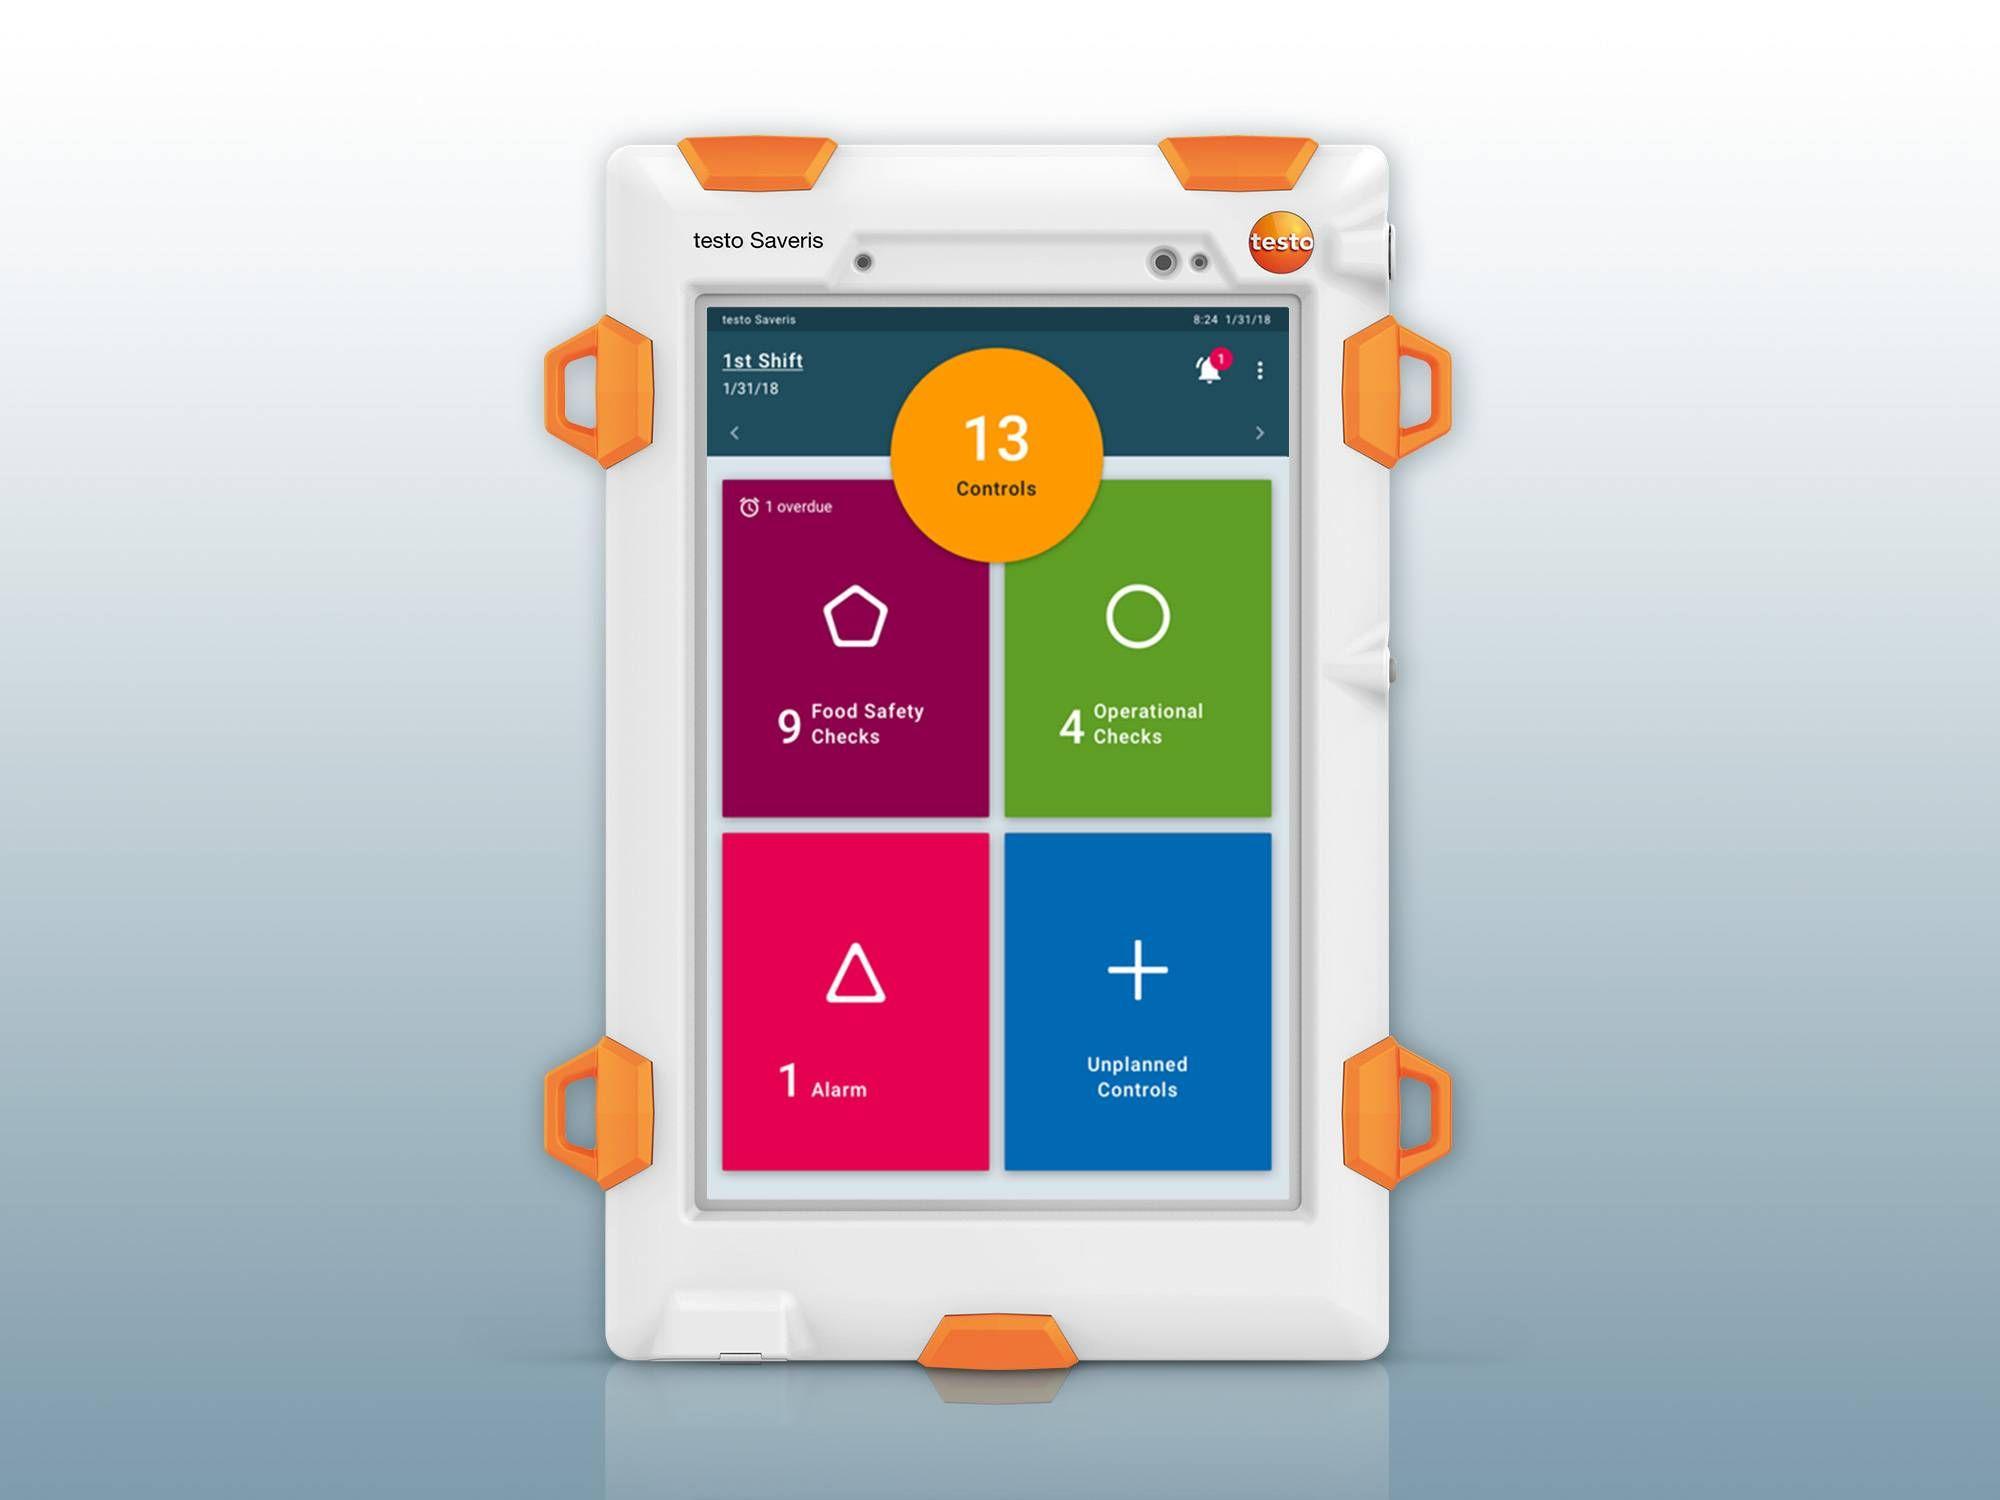 The testo Saveris Retail Chain Control Unit